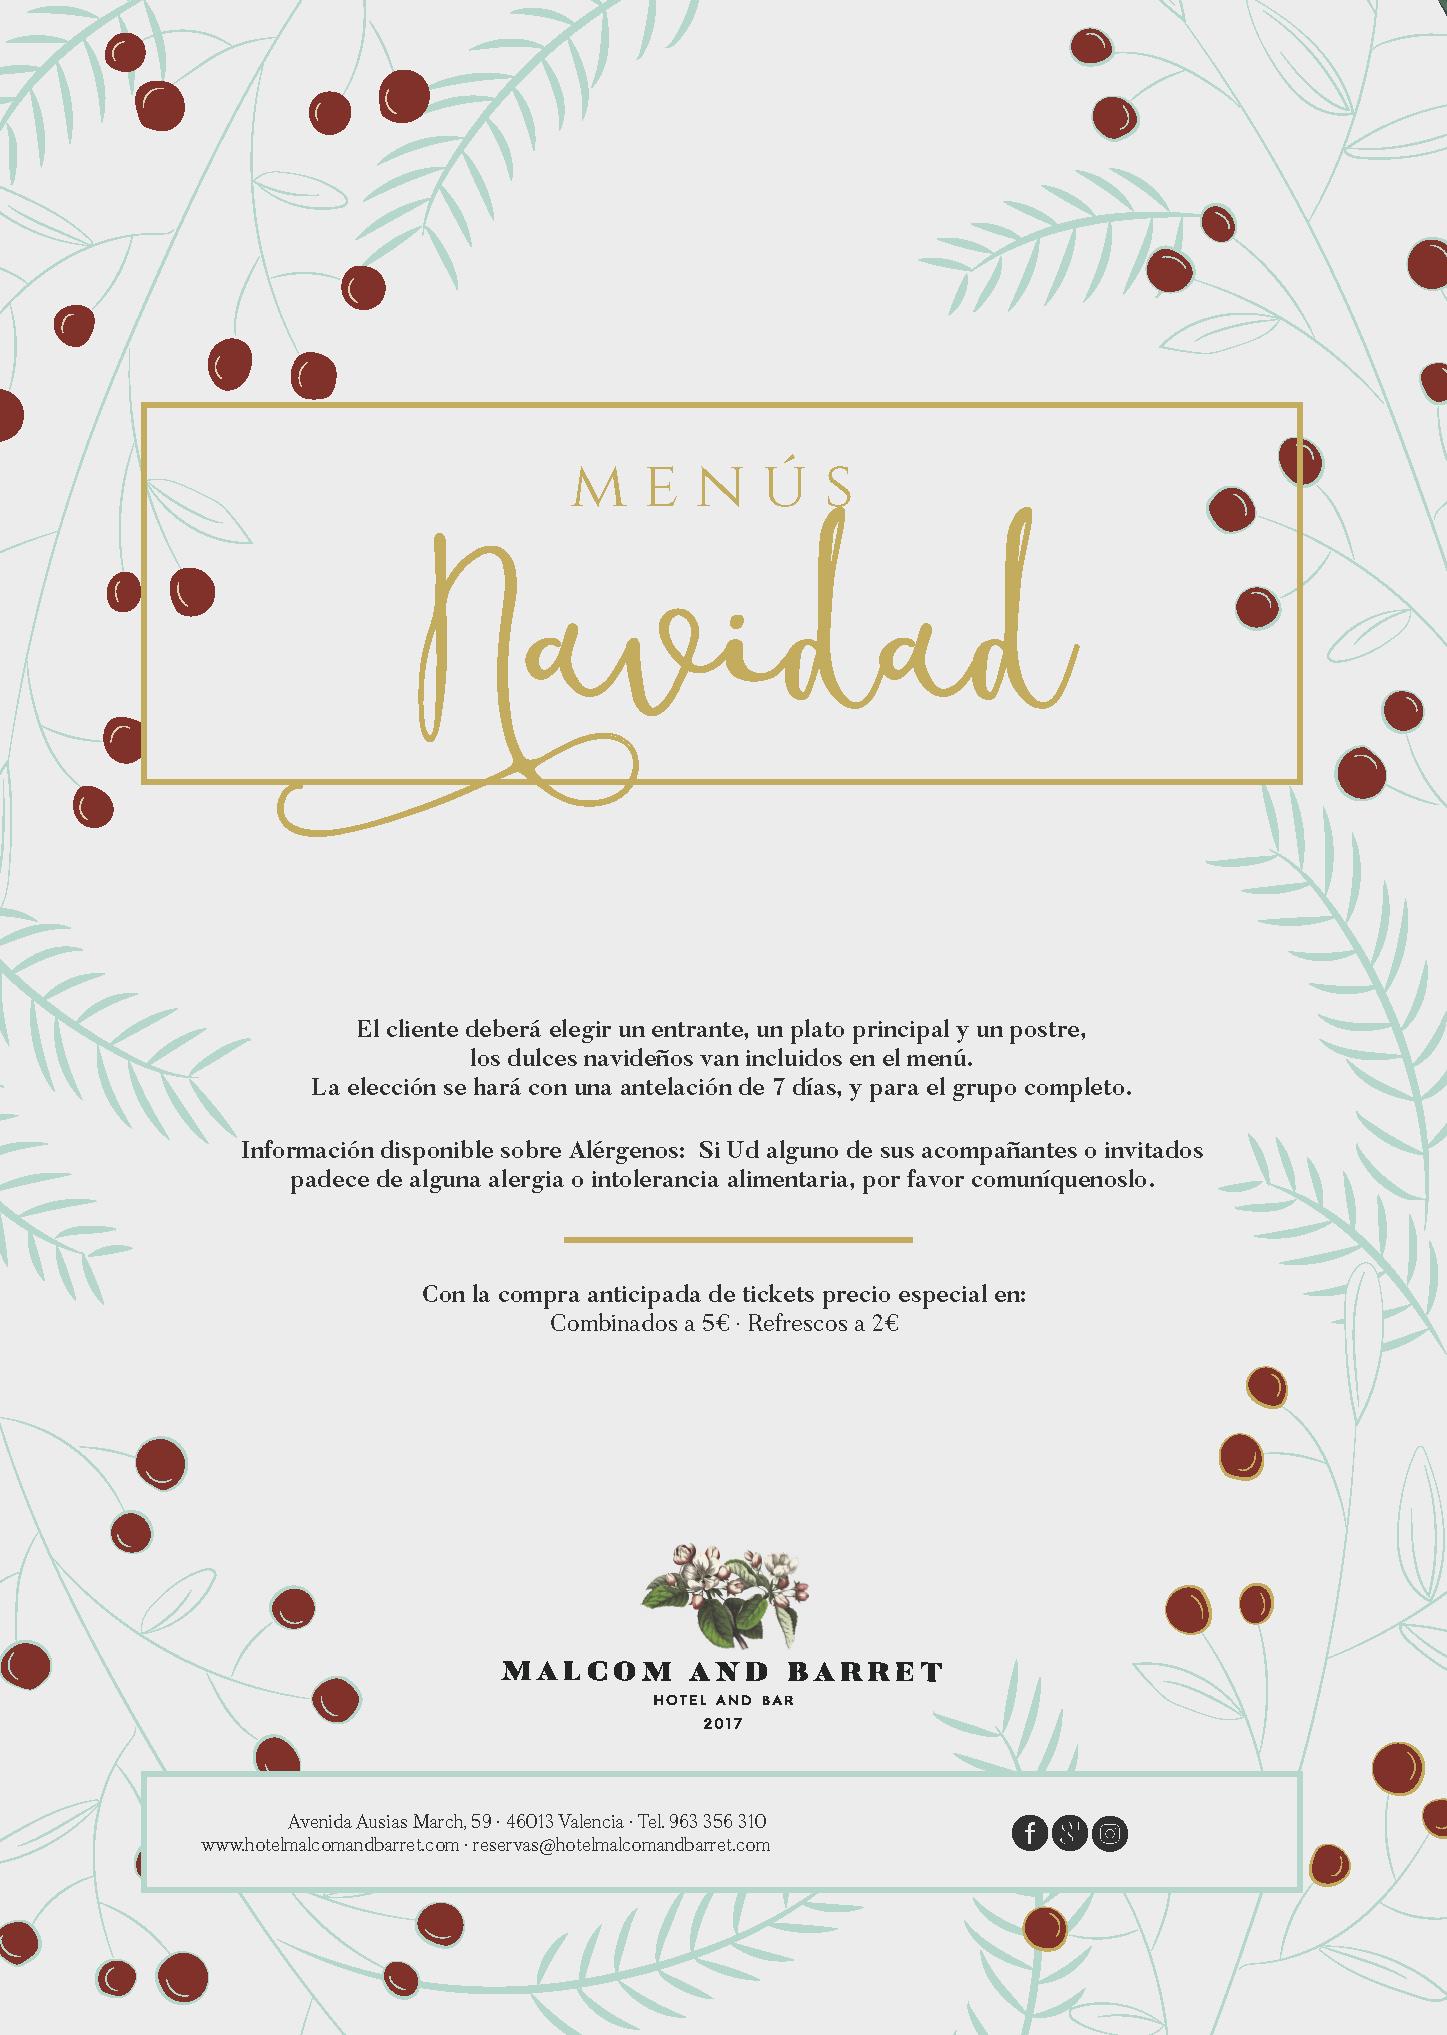 Menú Grupo Navidad Malcom and Barret ES (1)_Página_1